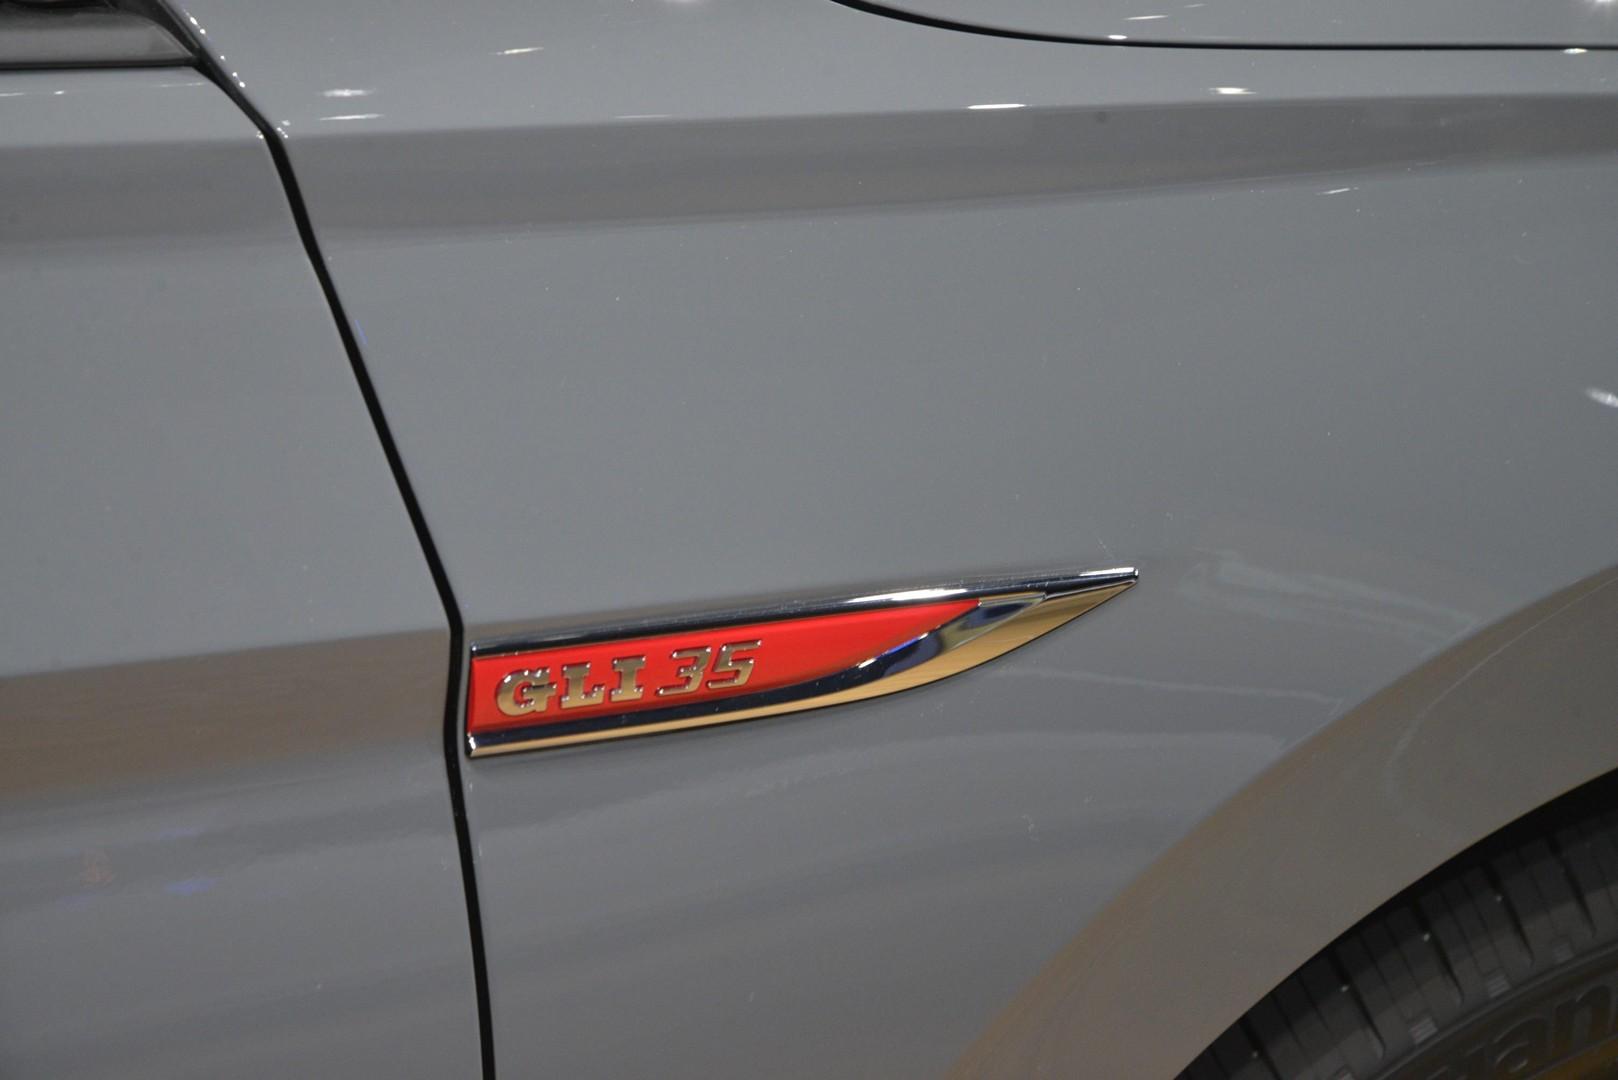 Volkswagen Recalls Over 1 Million Jetta and Beetle Models in China